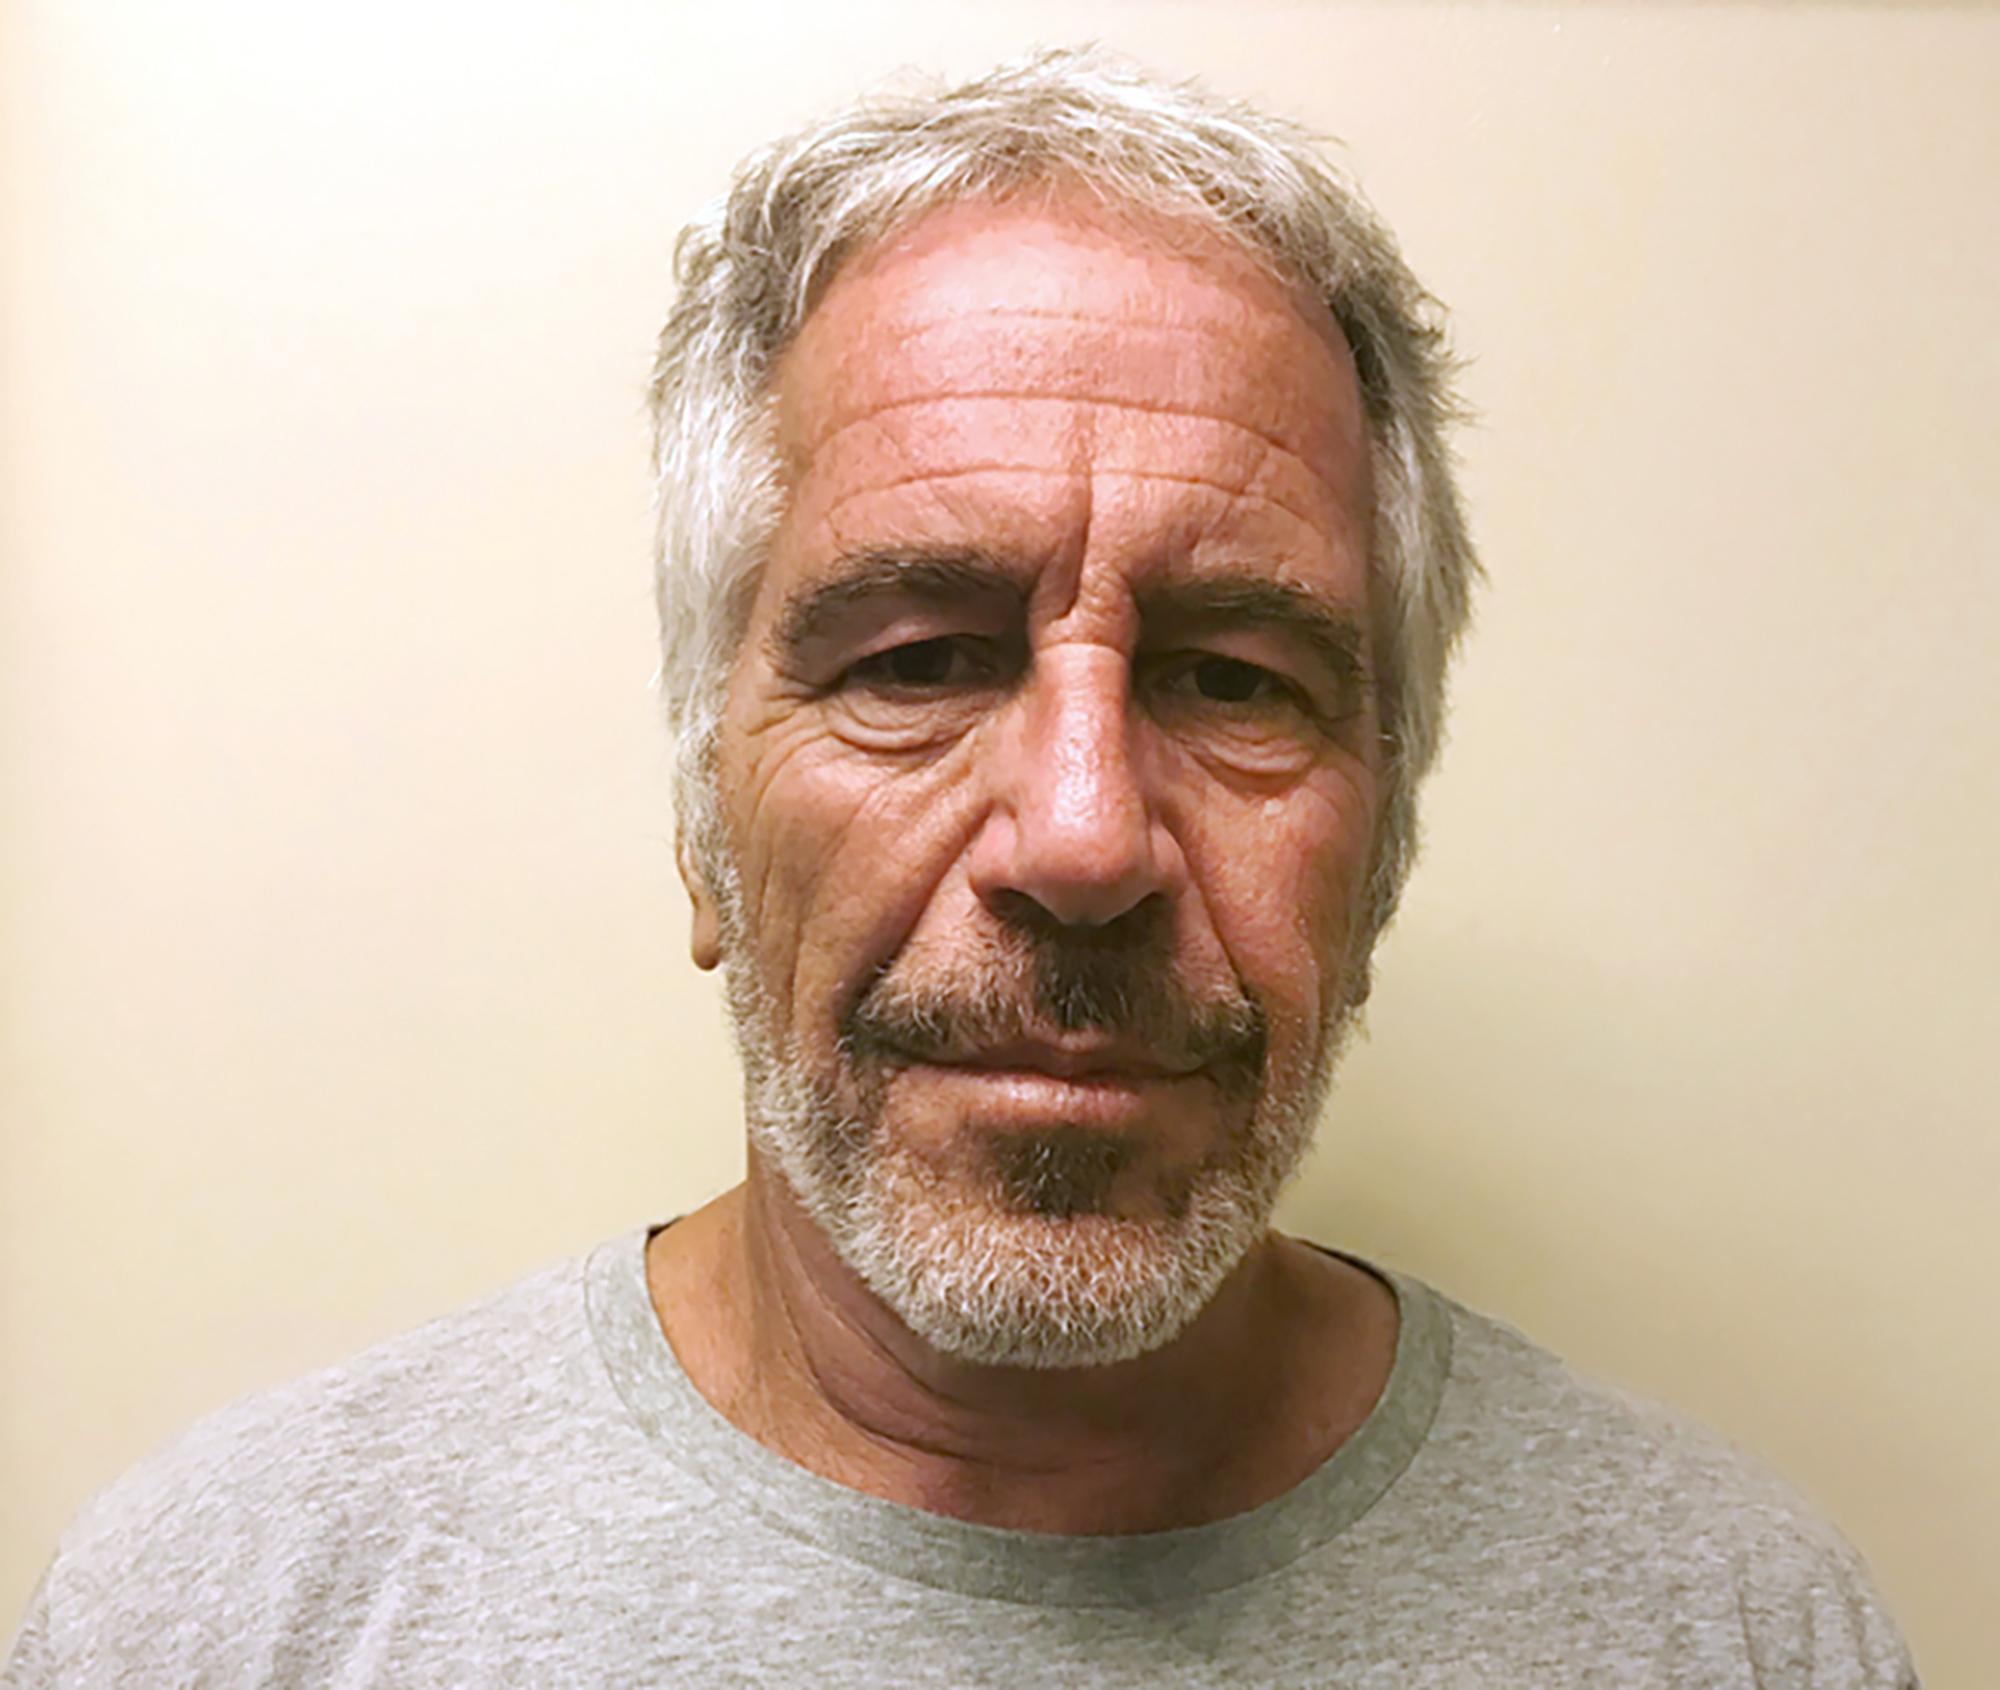 The Latest: Epstein accuser sues his estate, ex-girlfriend